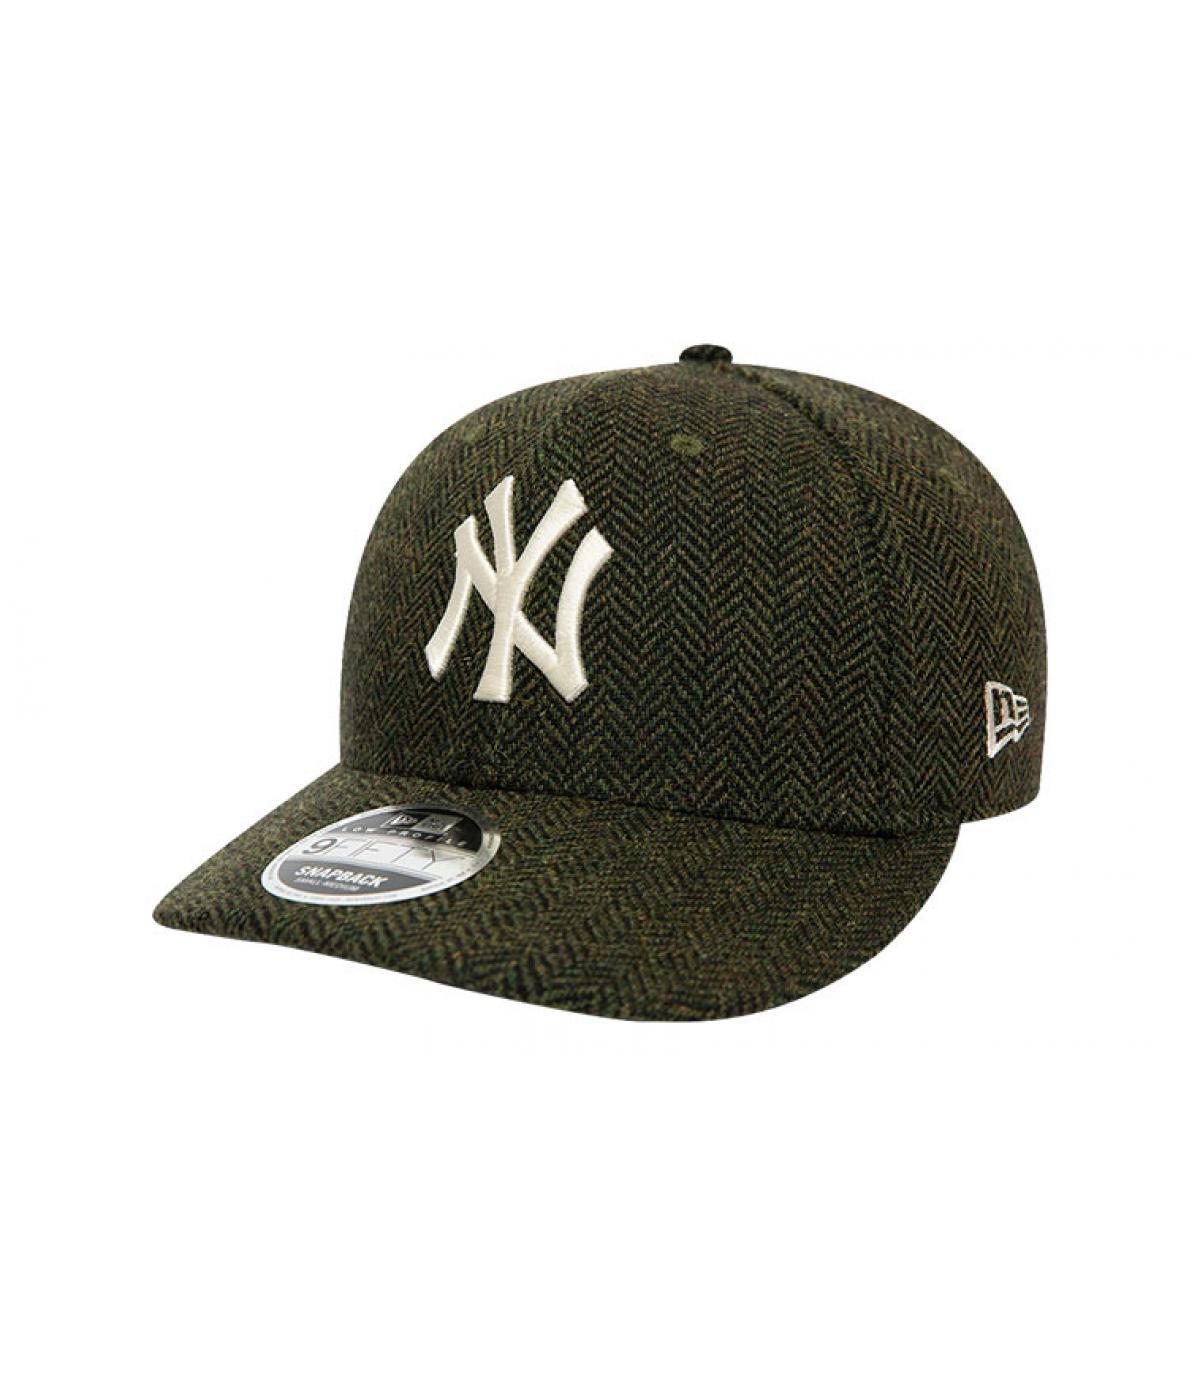 Détails Snapback MLB Tweed NY 950 army green - image 2